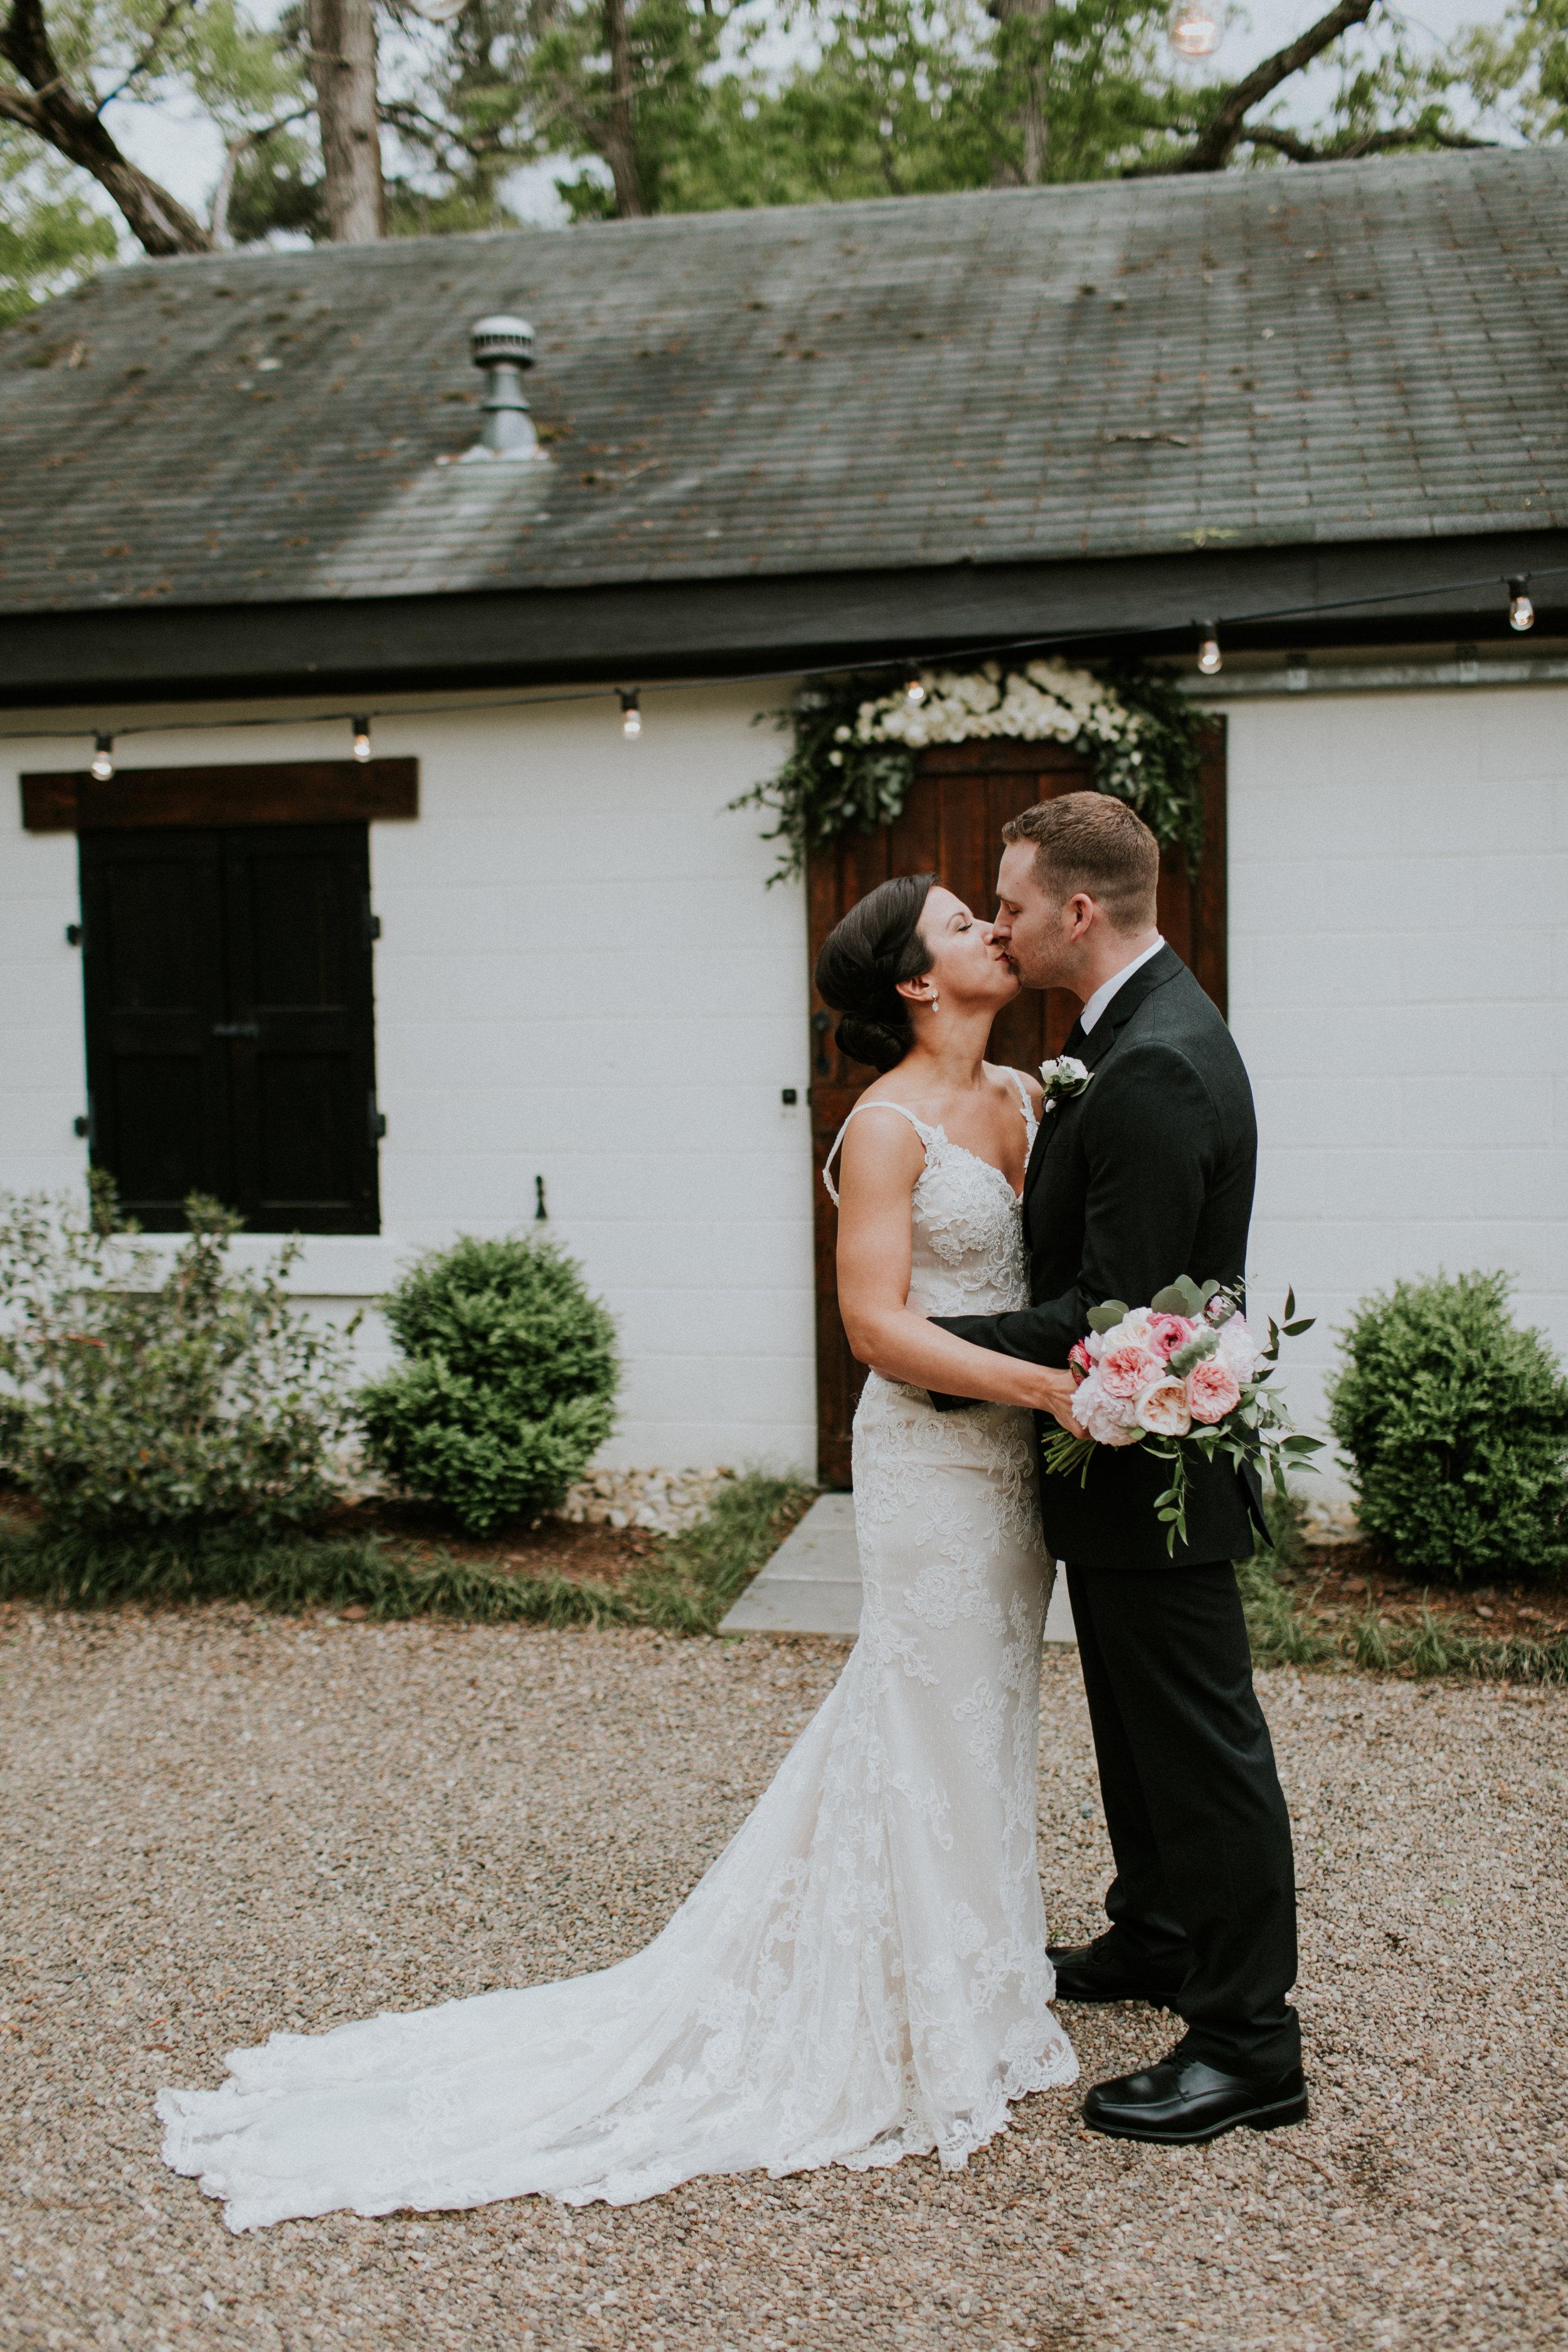 Christian_Reyes_Photography_Triad_NC_Wedding_Photographer-107.jpg